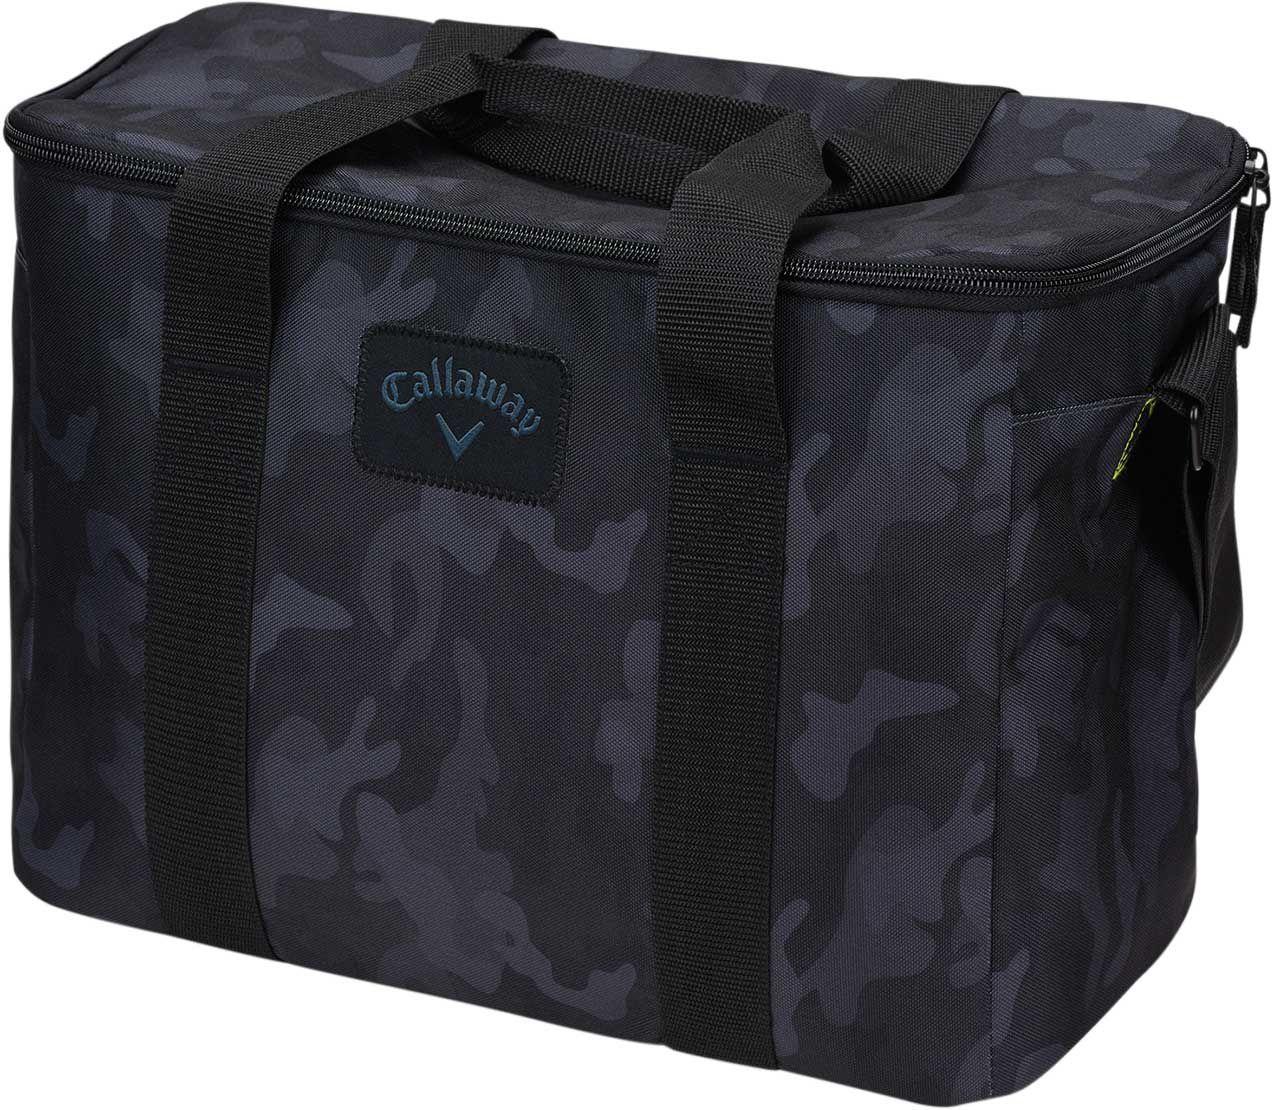 Golf Bag Coolers Shoe Bags  Totes  Best Price Guarantee